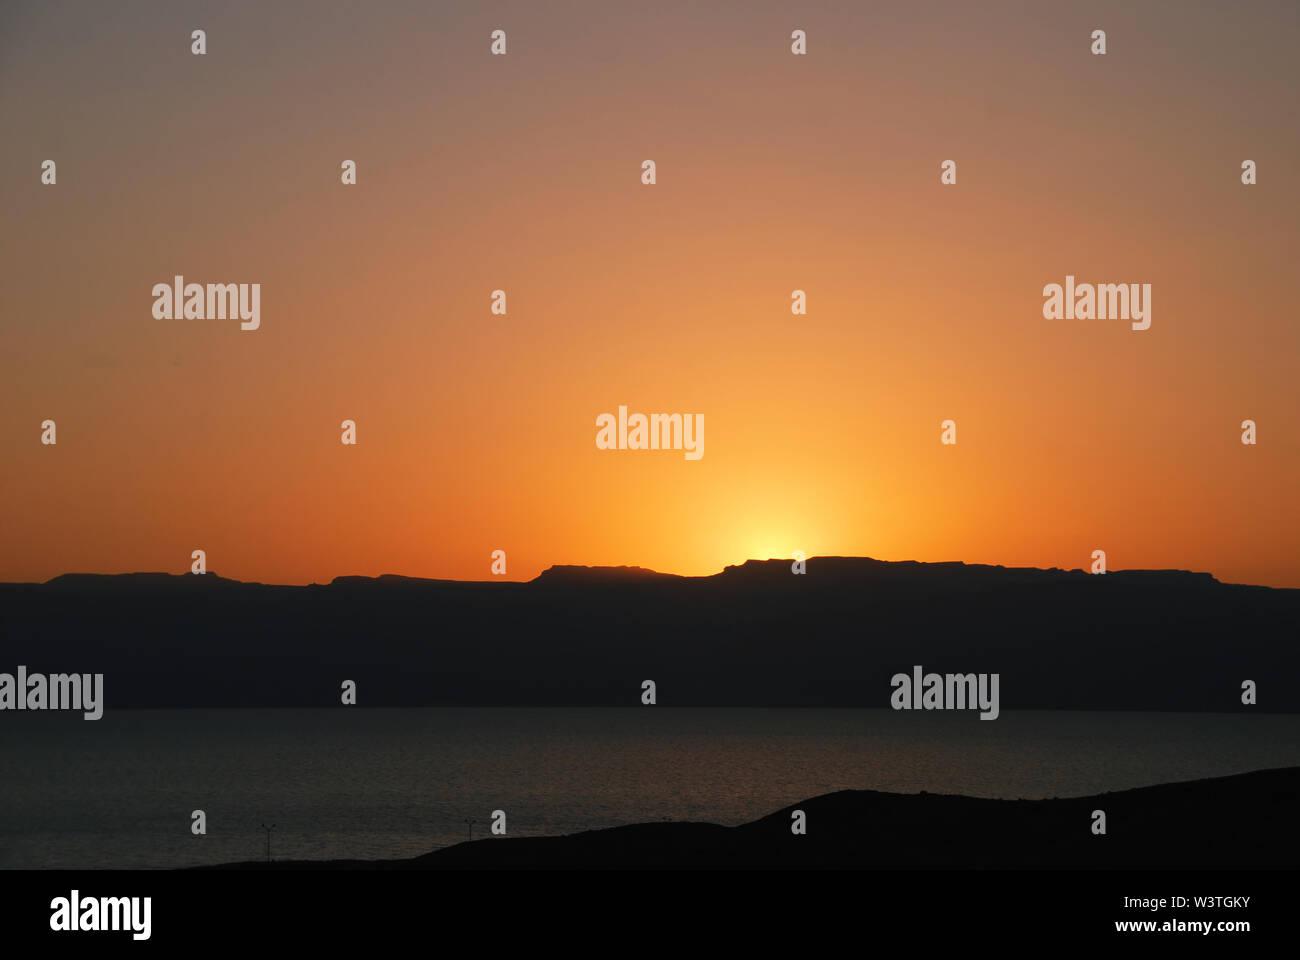 Sunset over the Gulf of Aqaba in Jordan - Stock Image